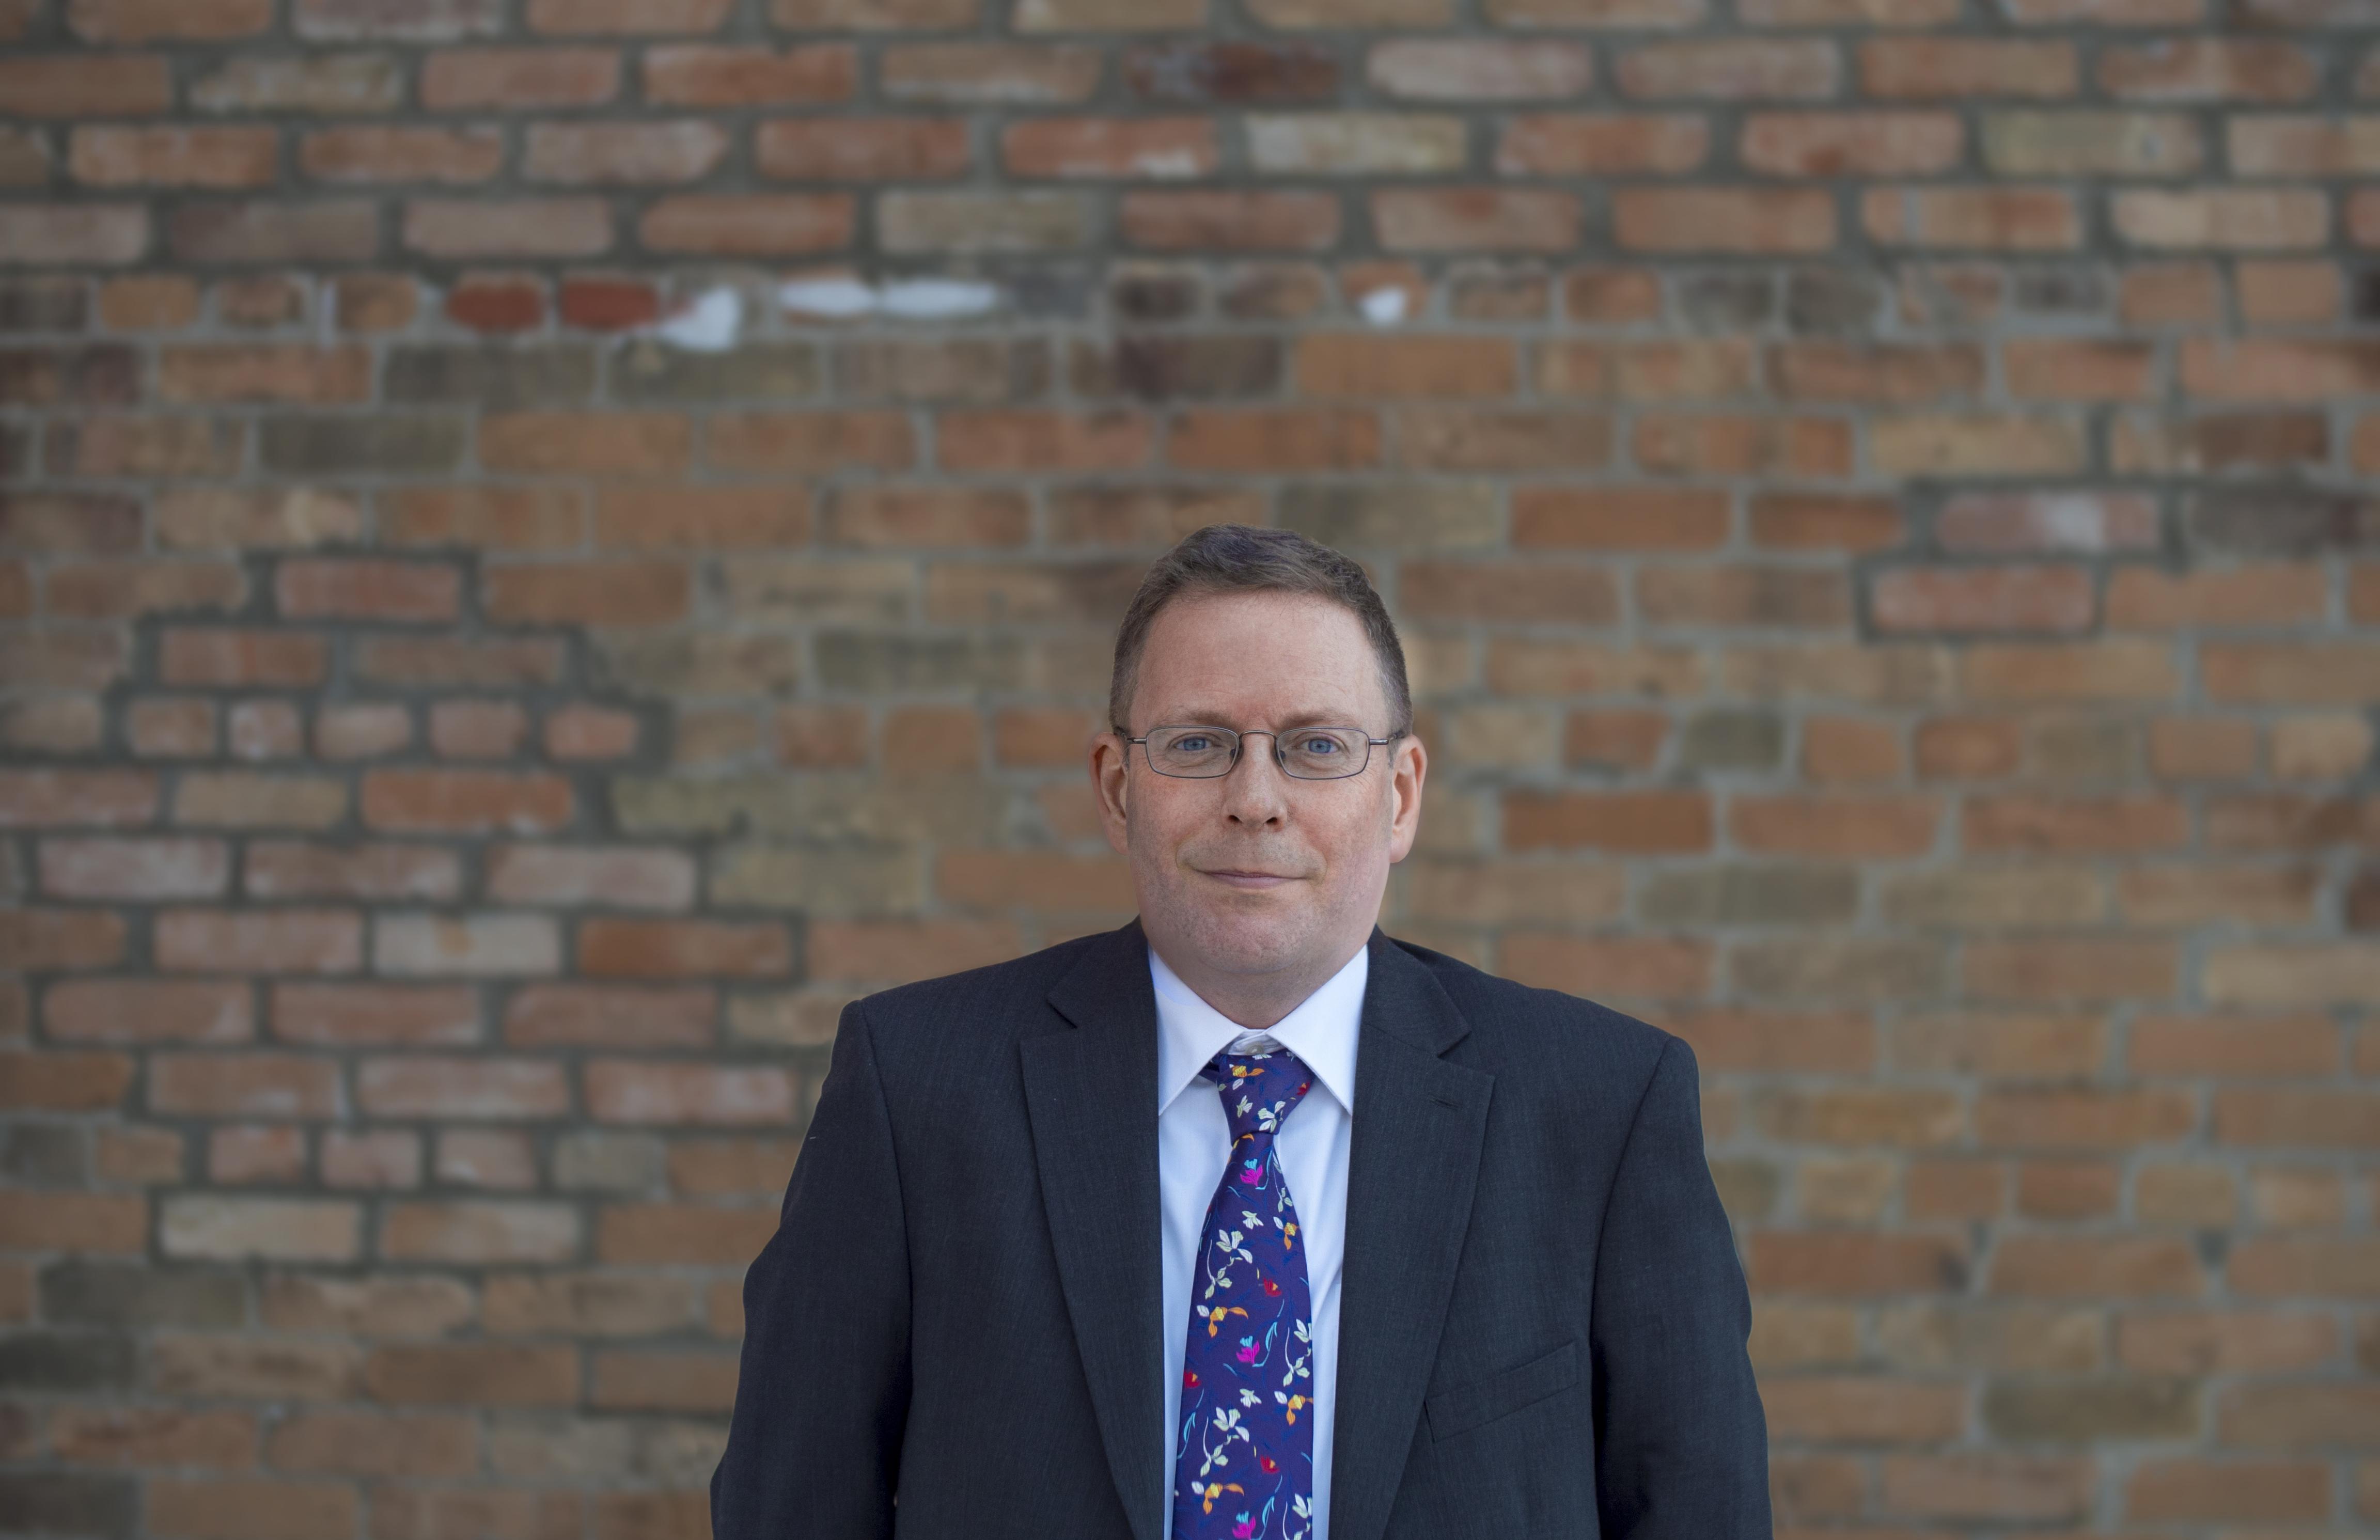 Gavin new image 1000x1000-1